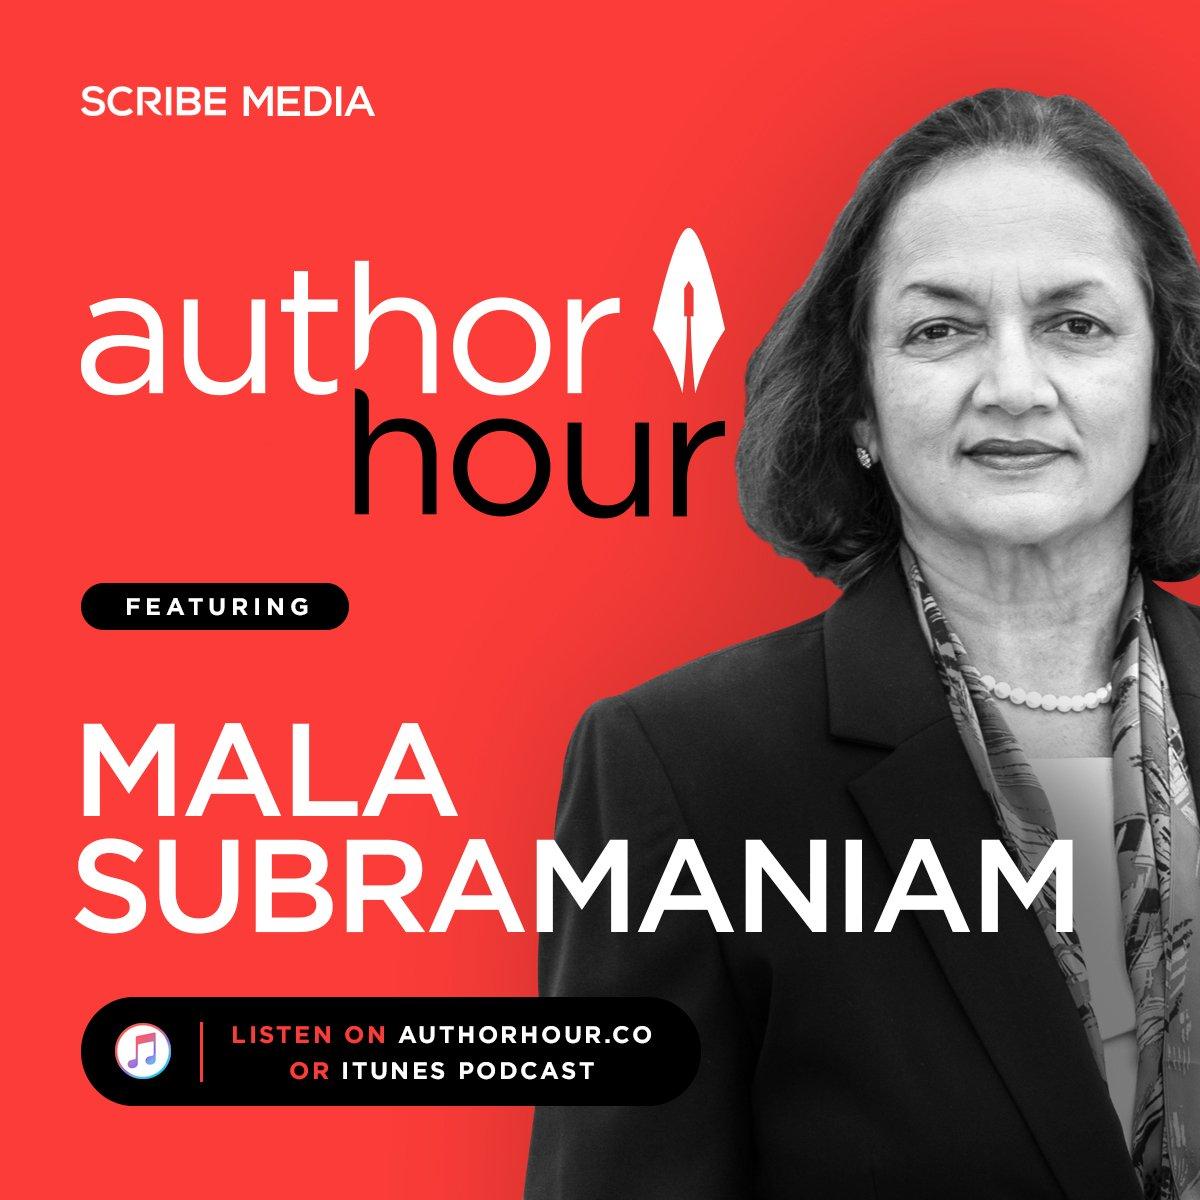 Mala Subramaniam interviewed on Author Hour